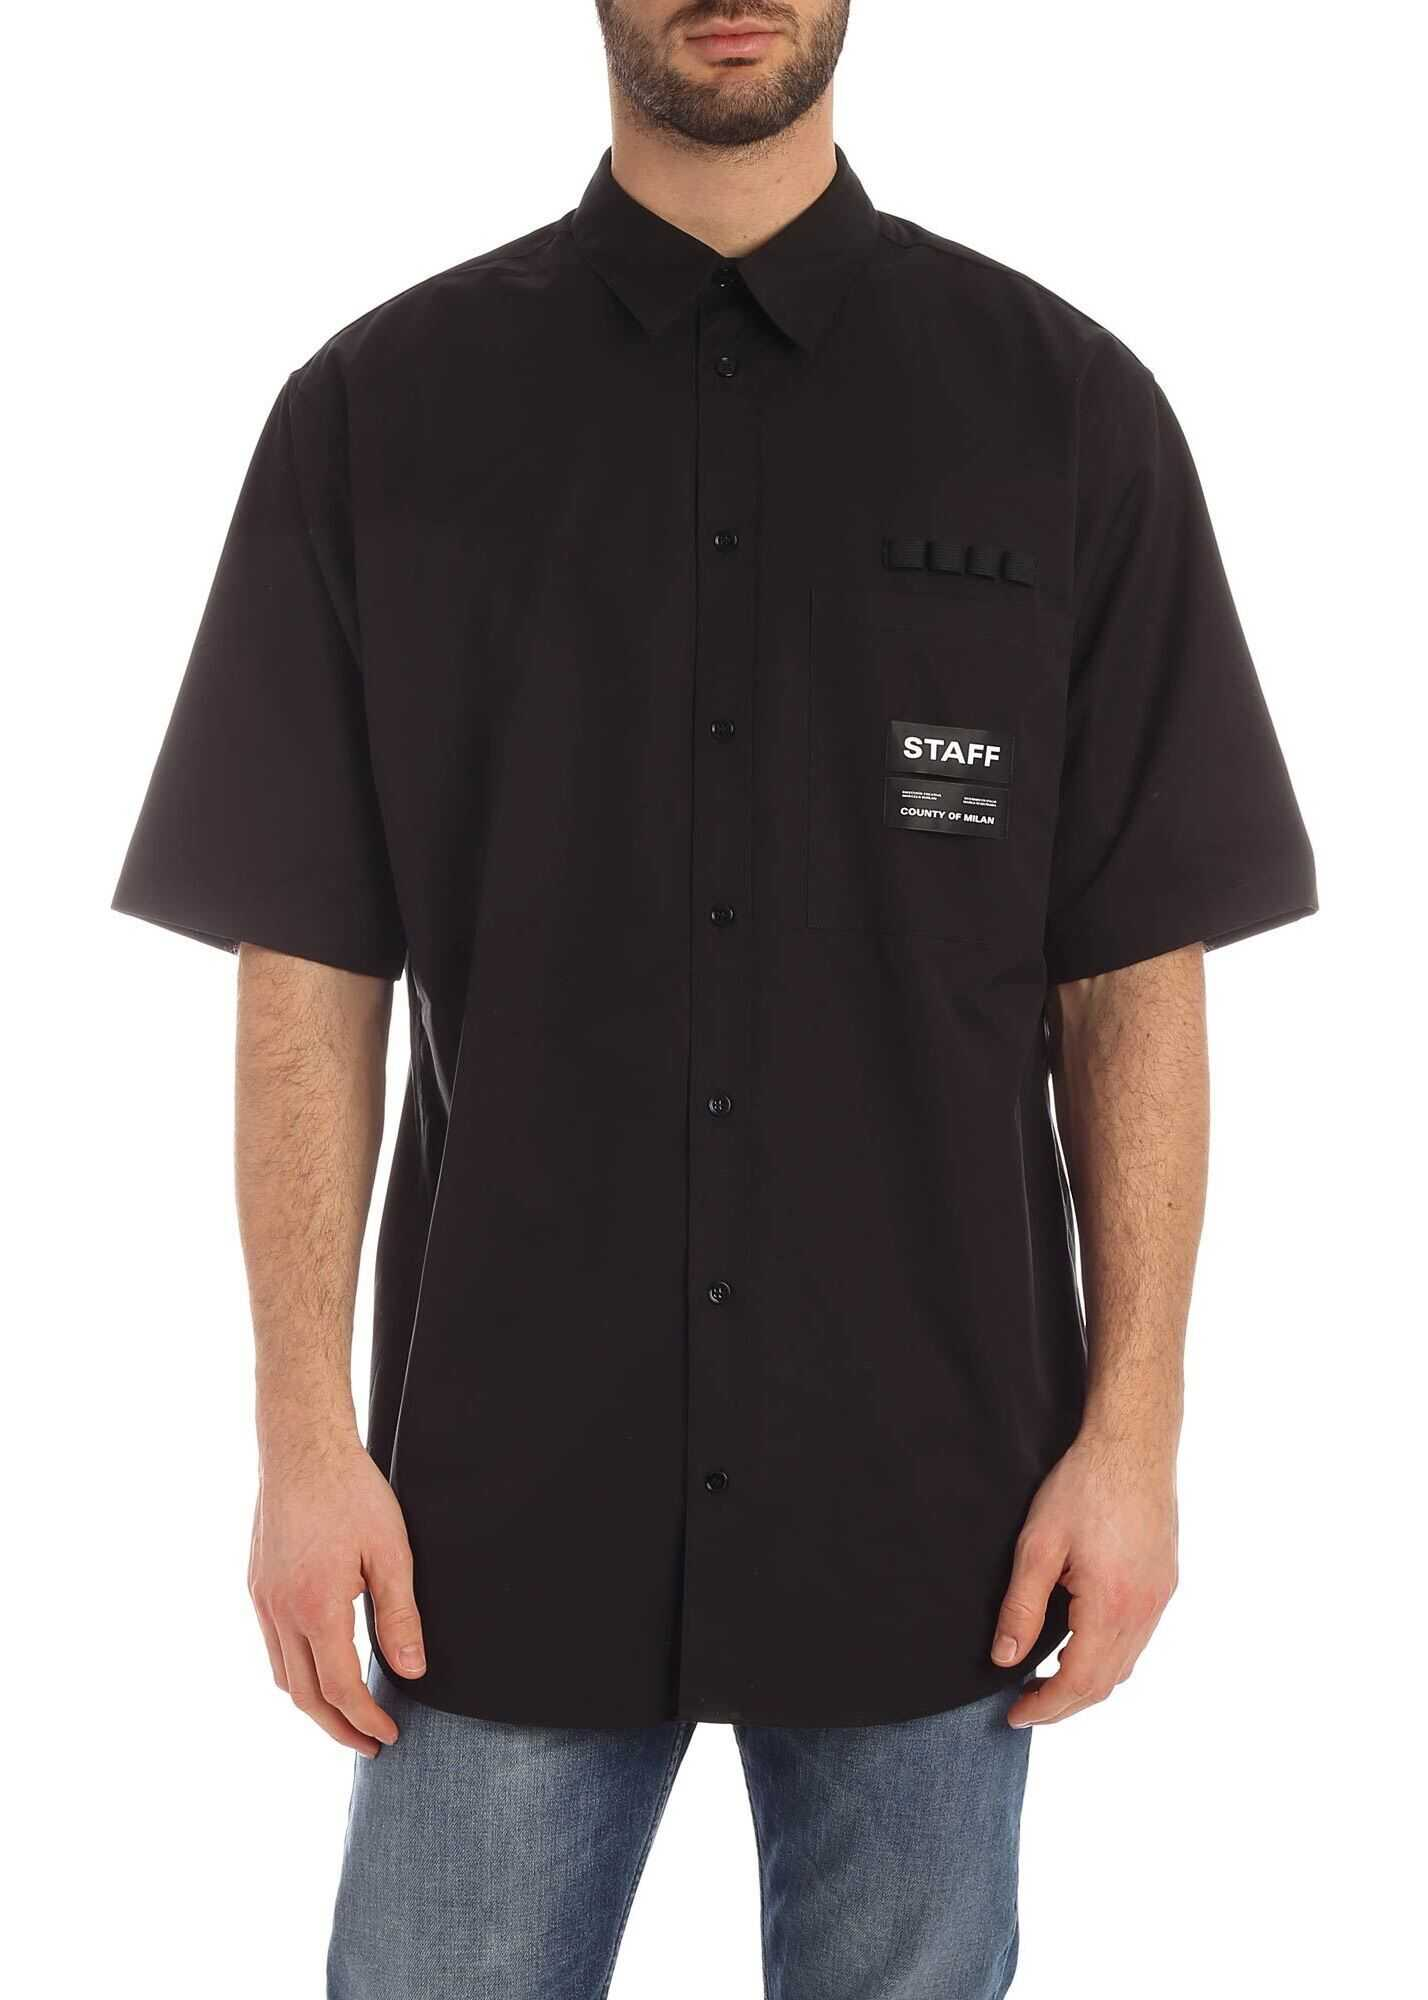 Marcelo Burlon Staff Shirt In Black Black